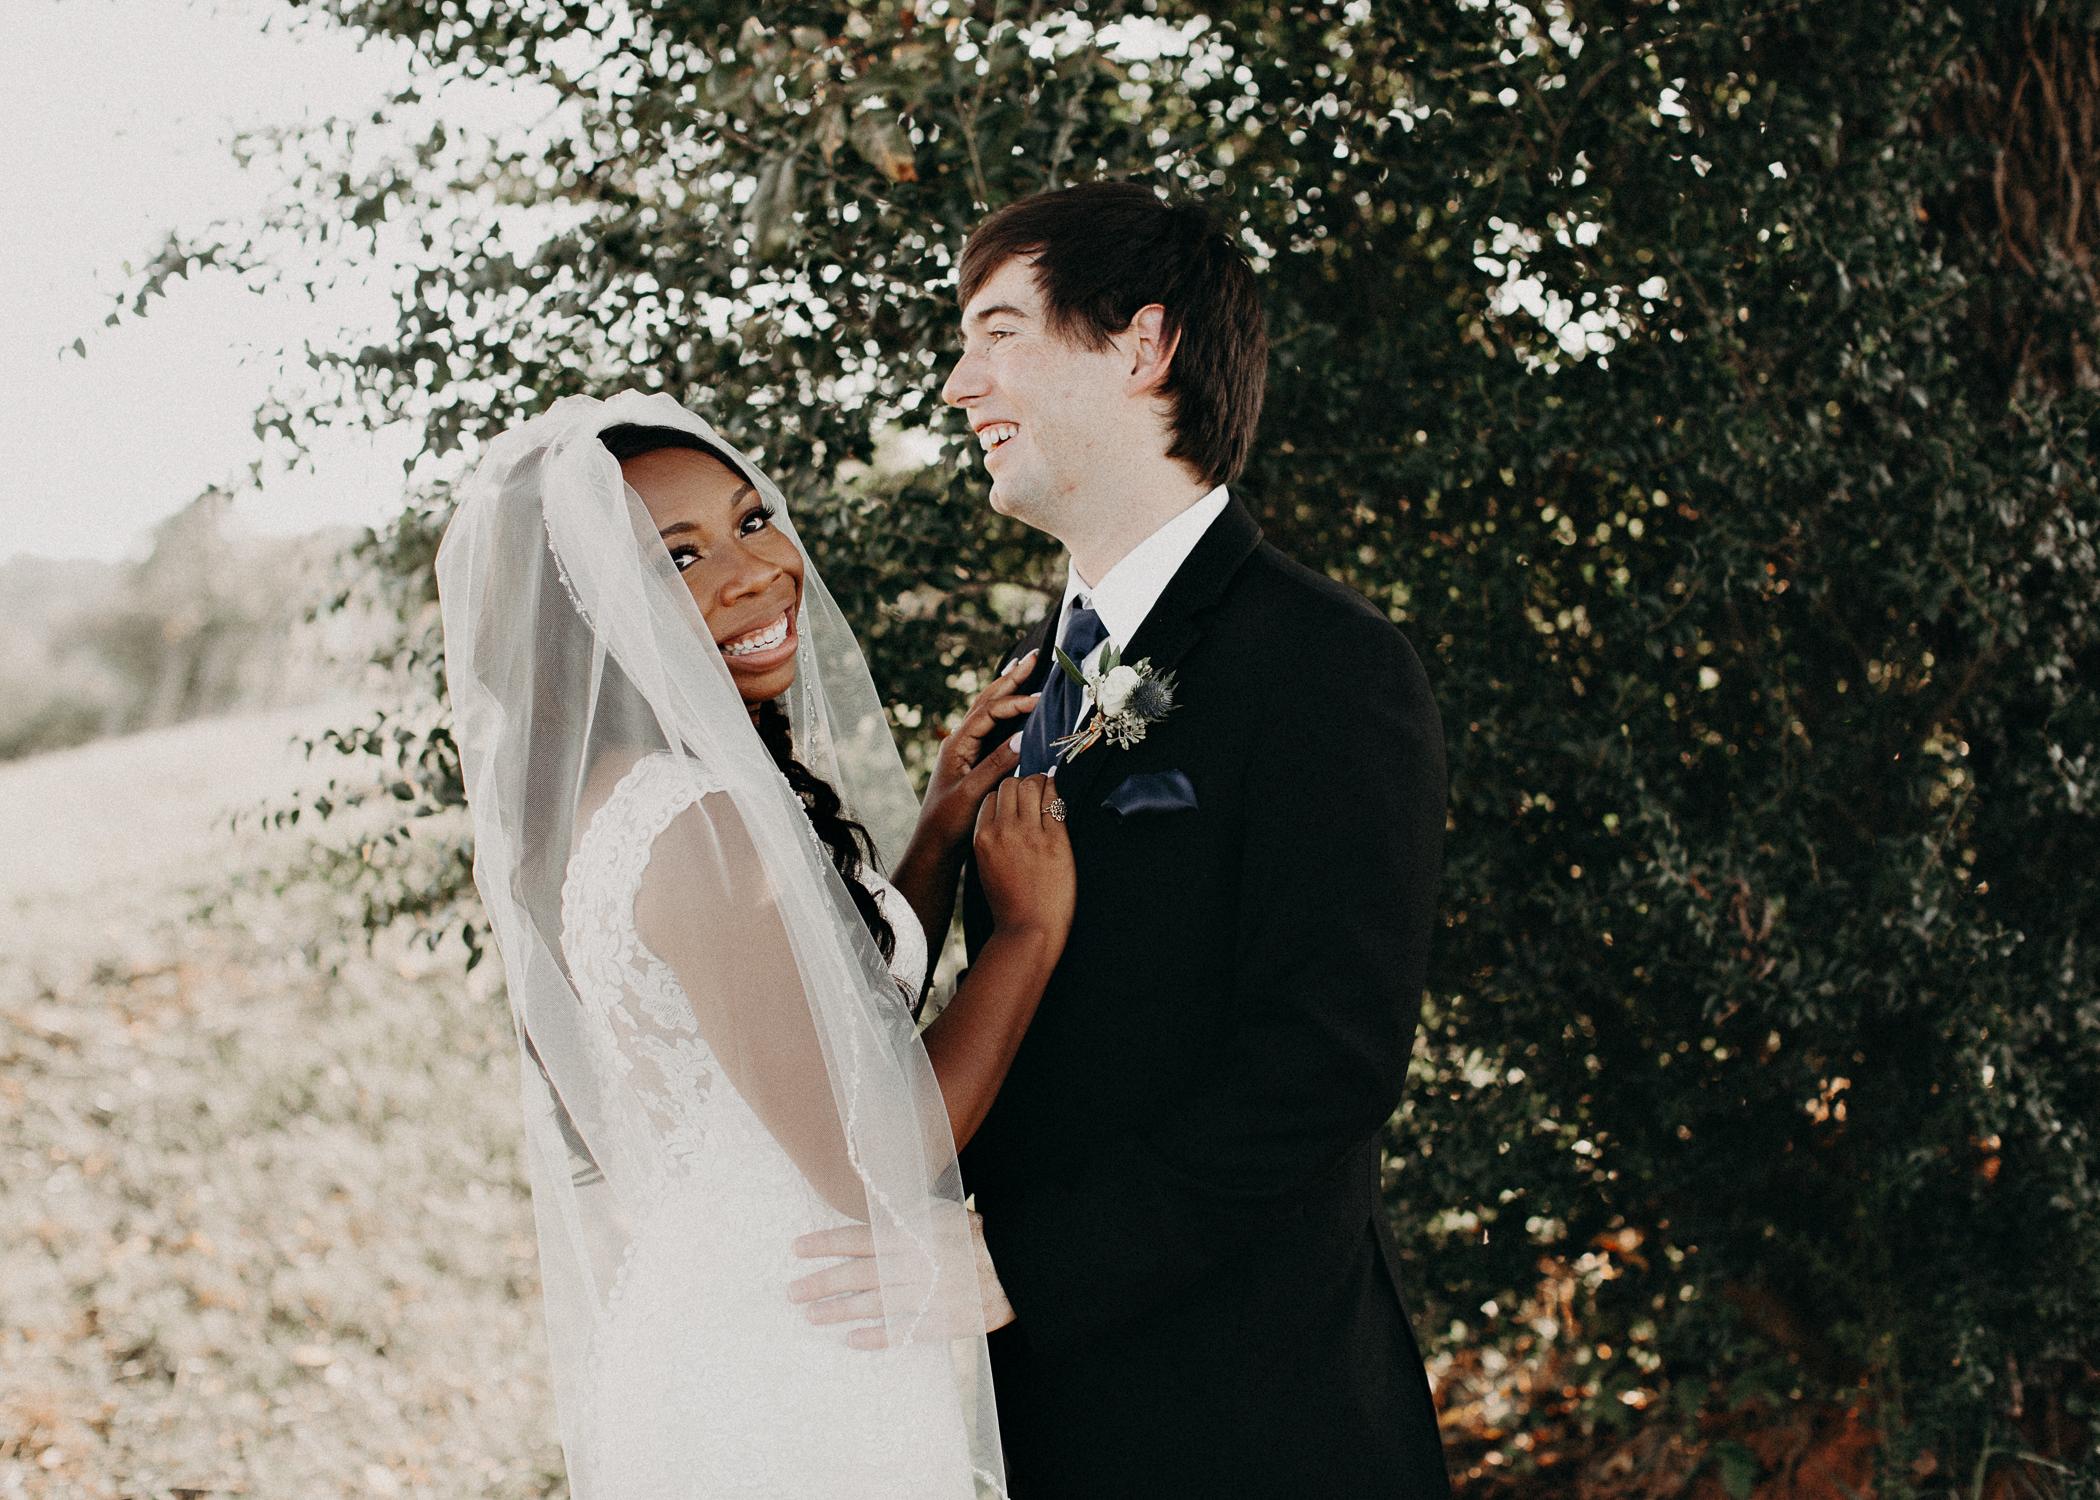 35- Wedding_day_atlanta_georgia_Bride_and_groom_first_look_and_portraits_aline_marin_photography.jpg